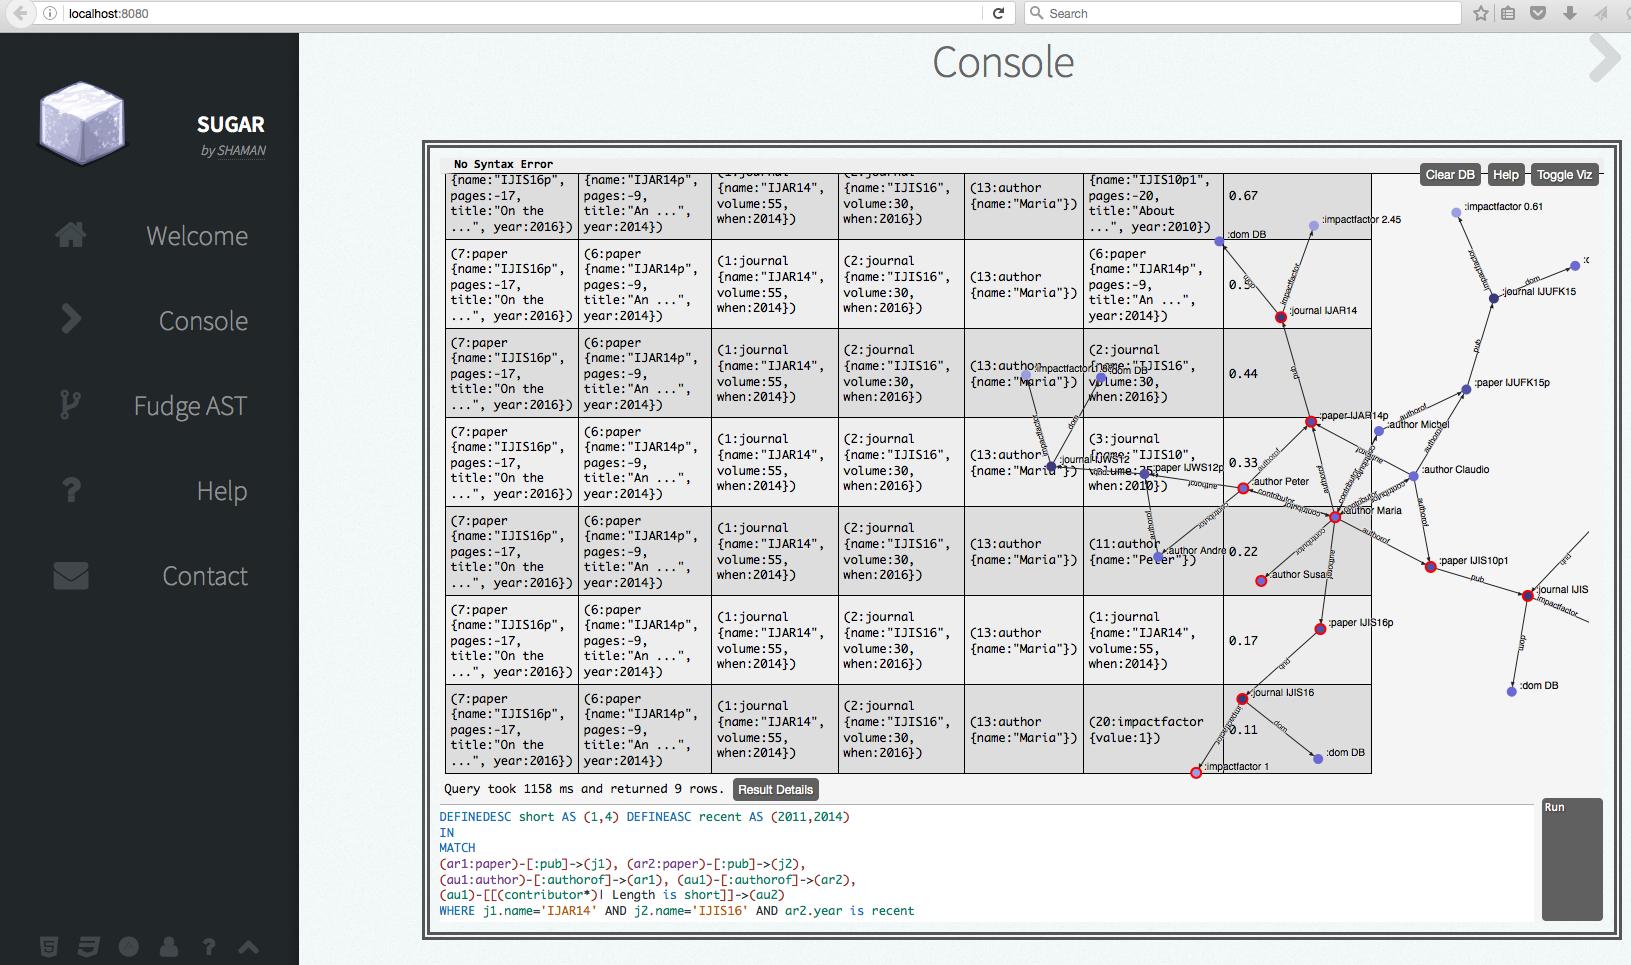 A screenshot of the SUGAR interface